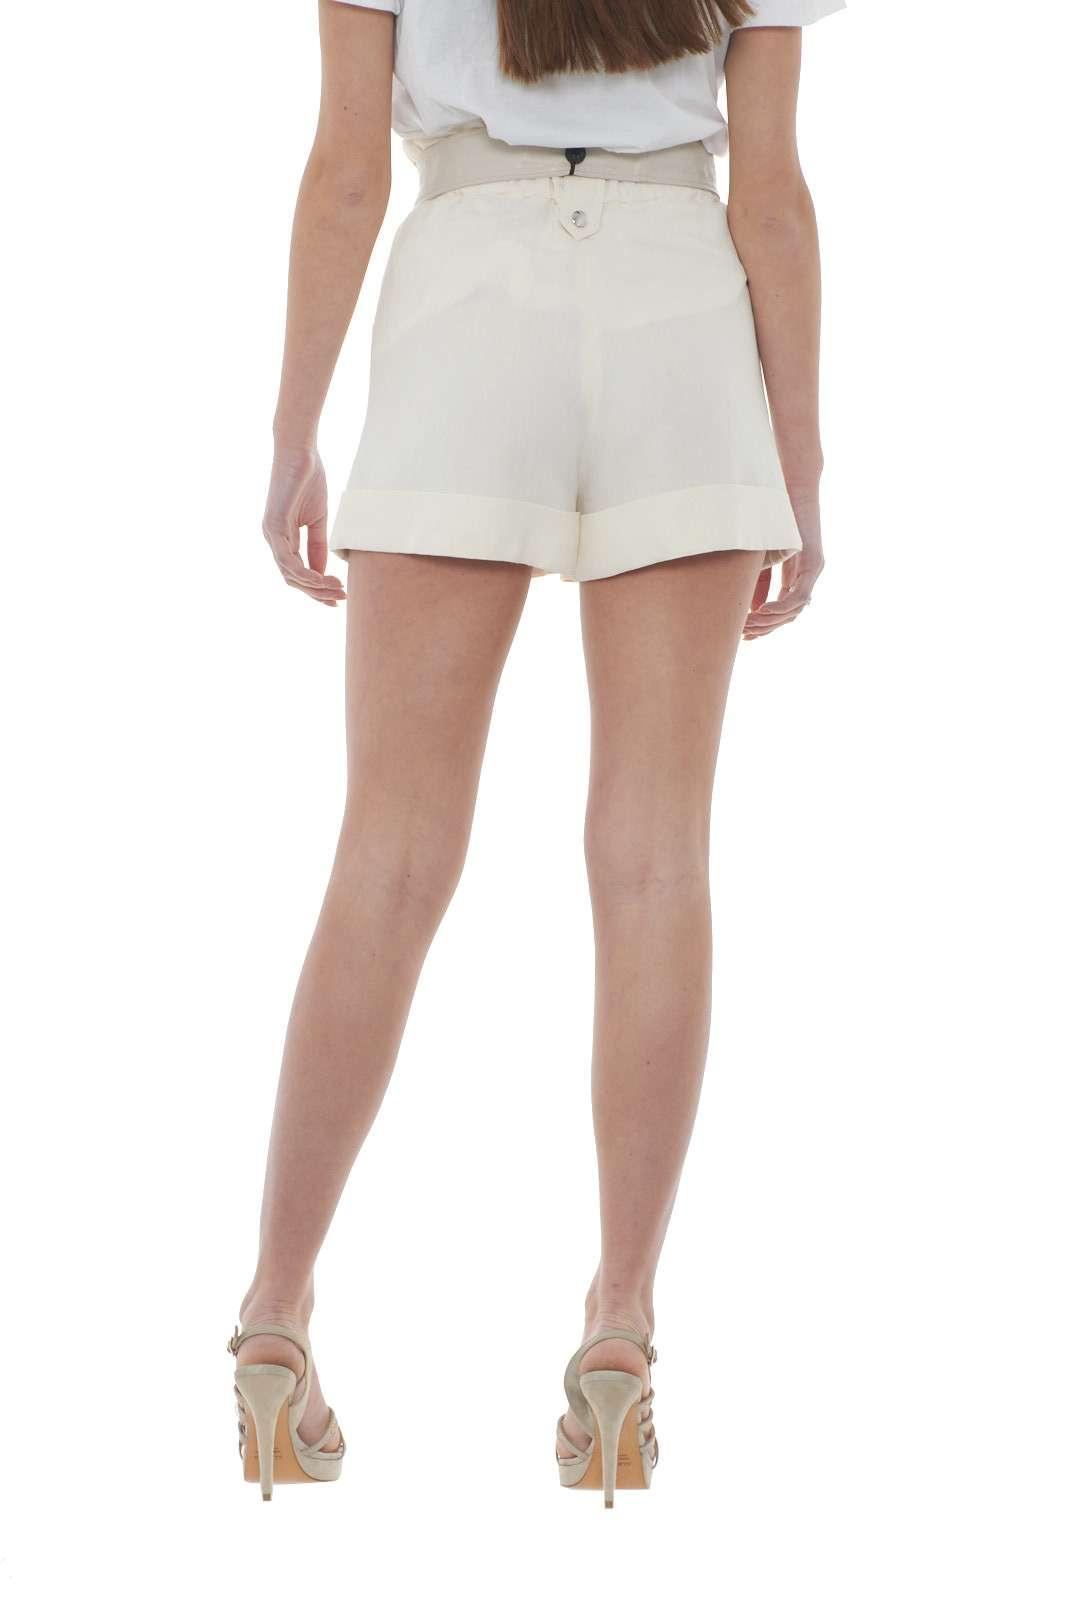 https://www.parmax.com/media/catalog/product/a/i/PE-outlet_parmax-shorts-donna-TwinSet-201TT2213-C.jpg